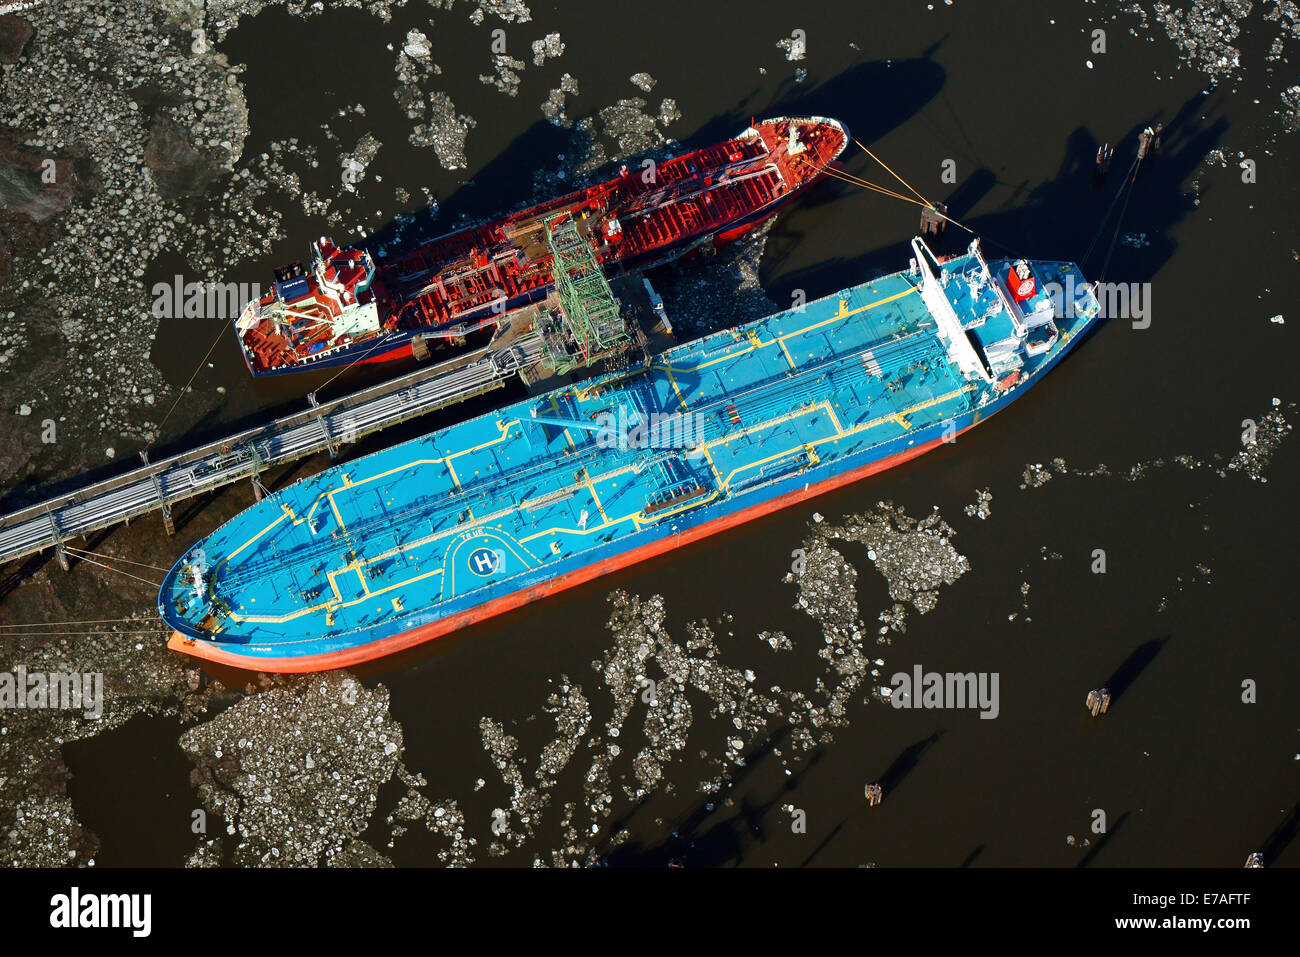 'True', a tanker unloading crude oil in the Kattwykhafen harbour, aerial view, Hamburg, Germany - Stock Image